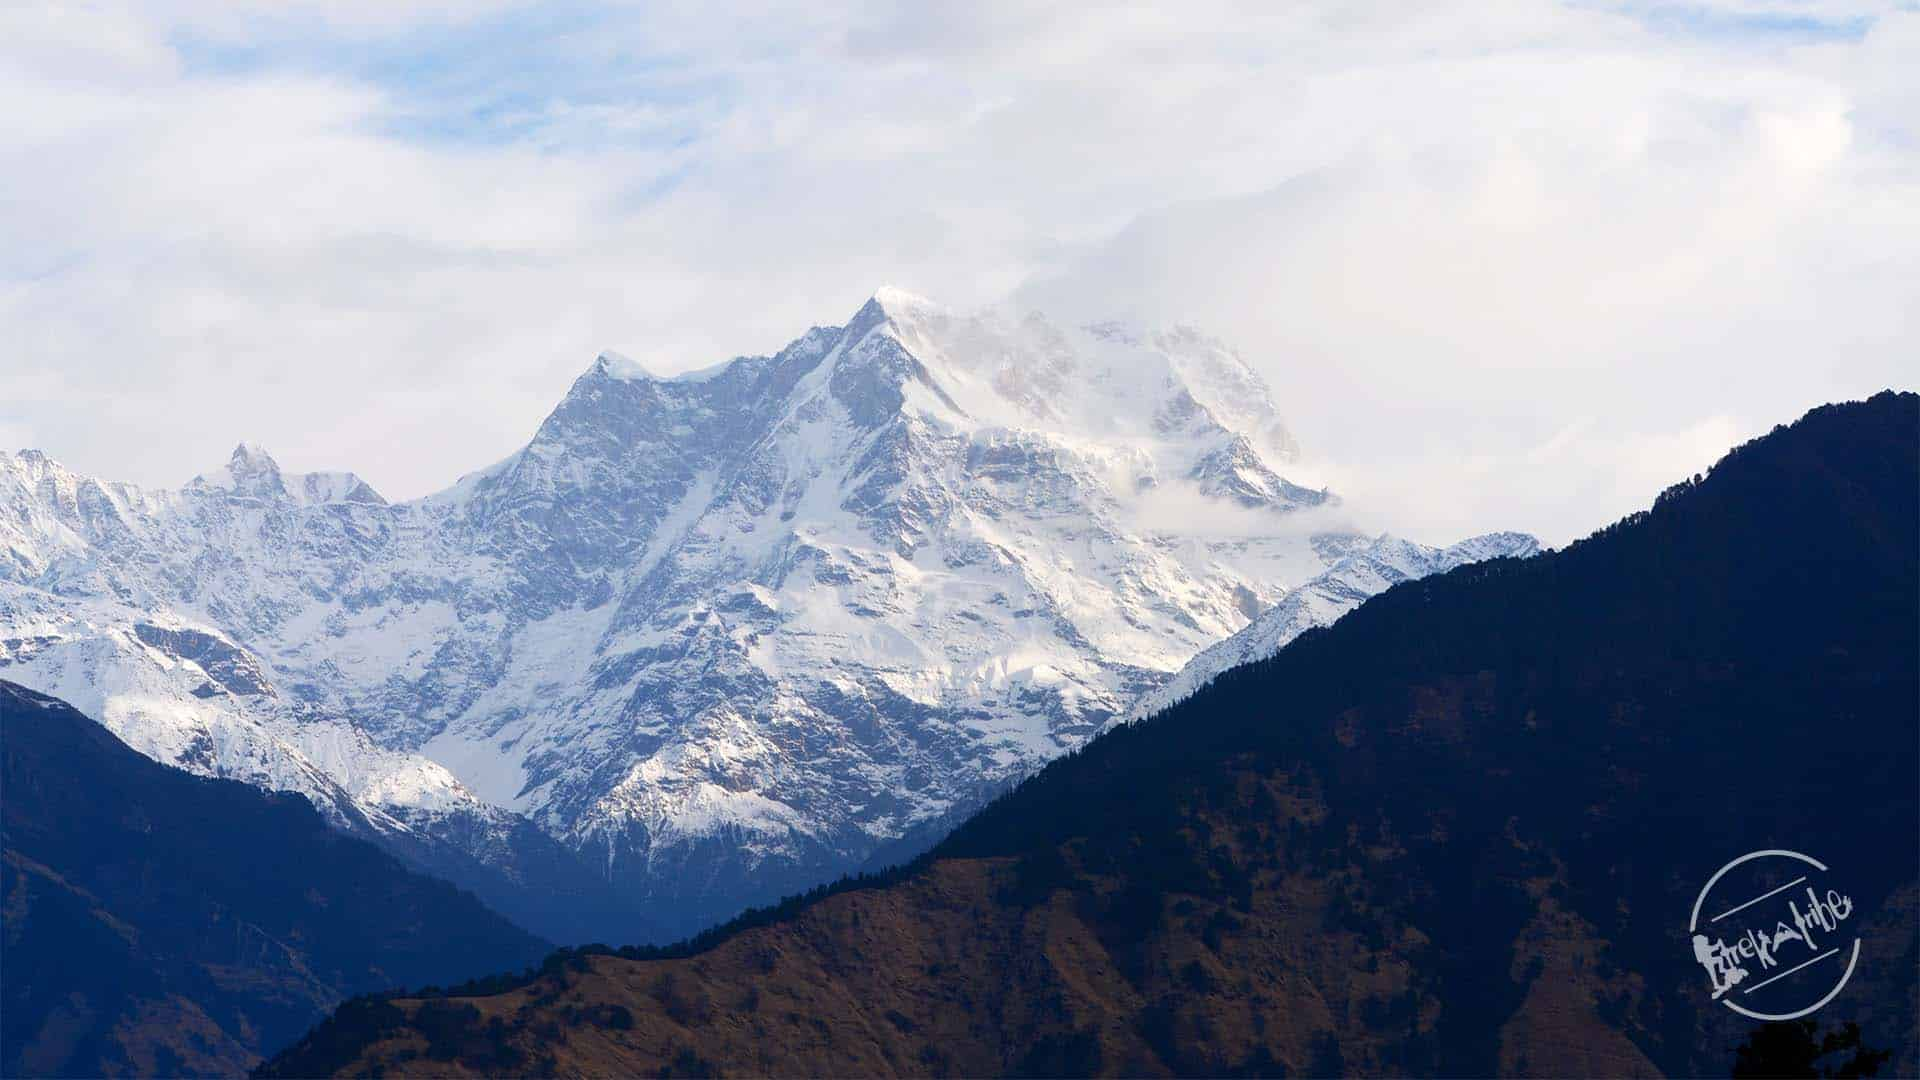 Chaukhamba Peak View from Chandershila Peak